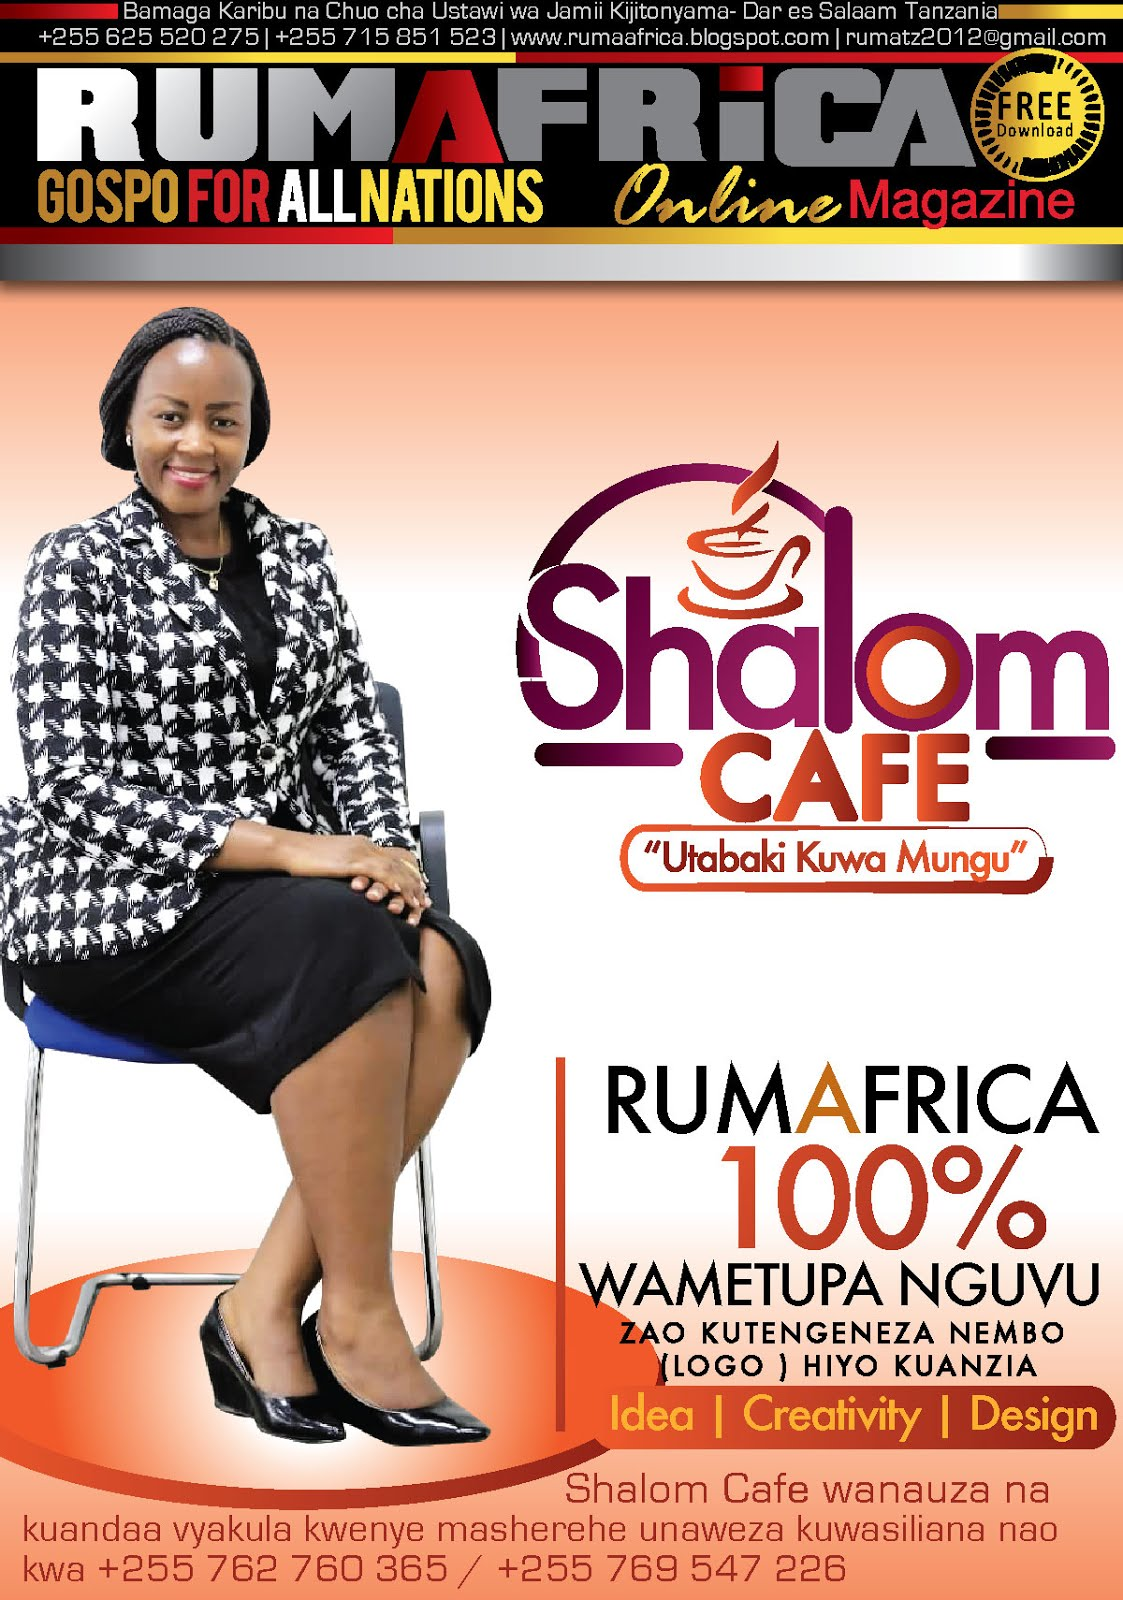 SHALOM CAFE